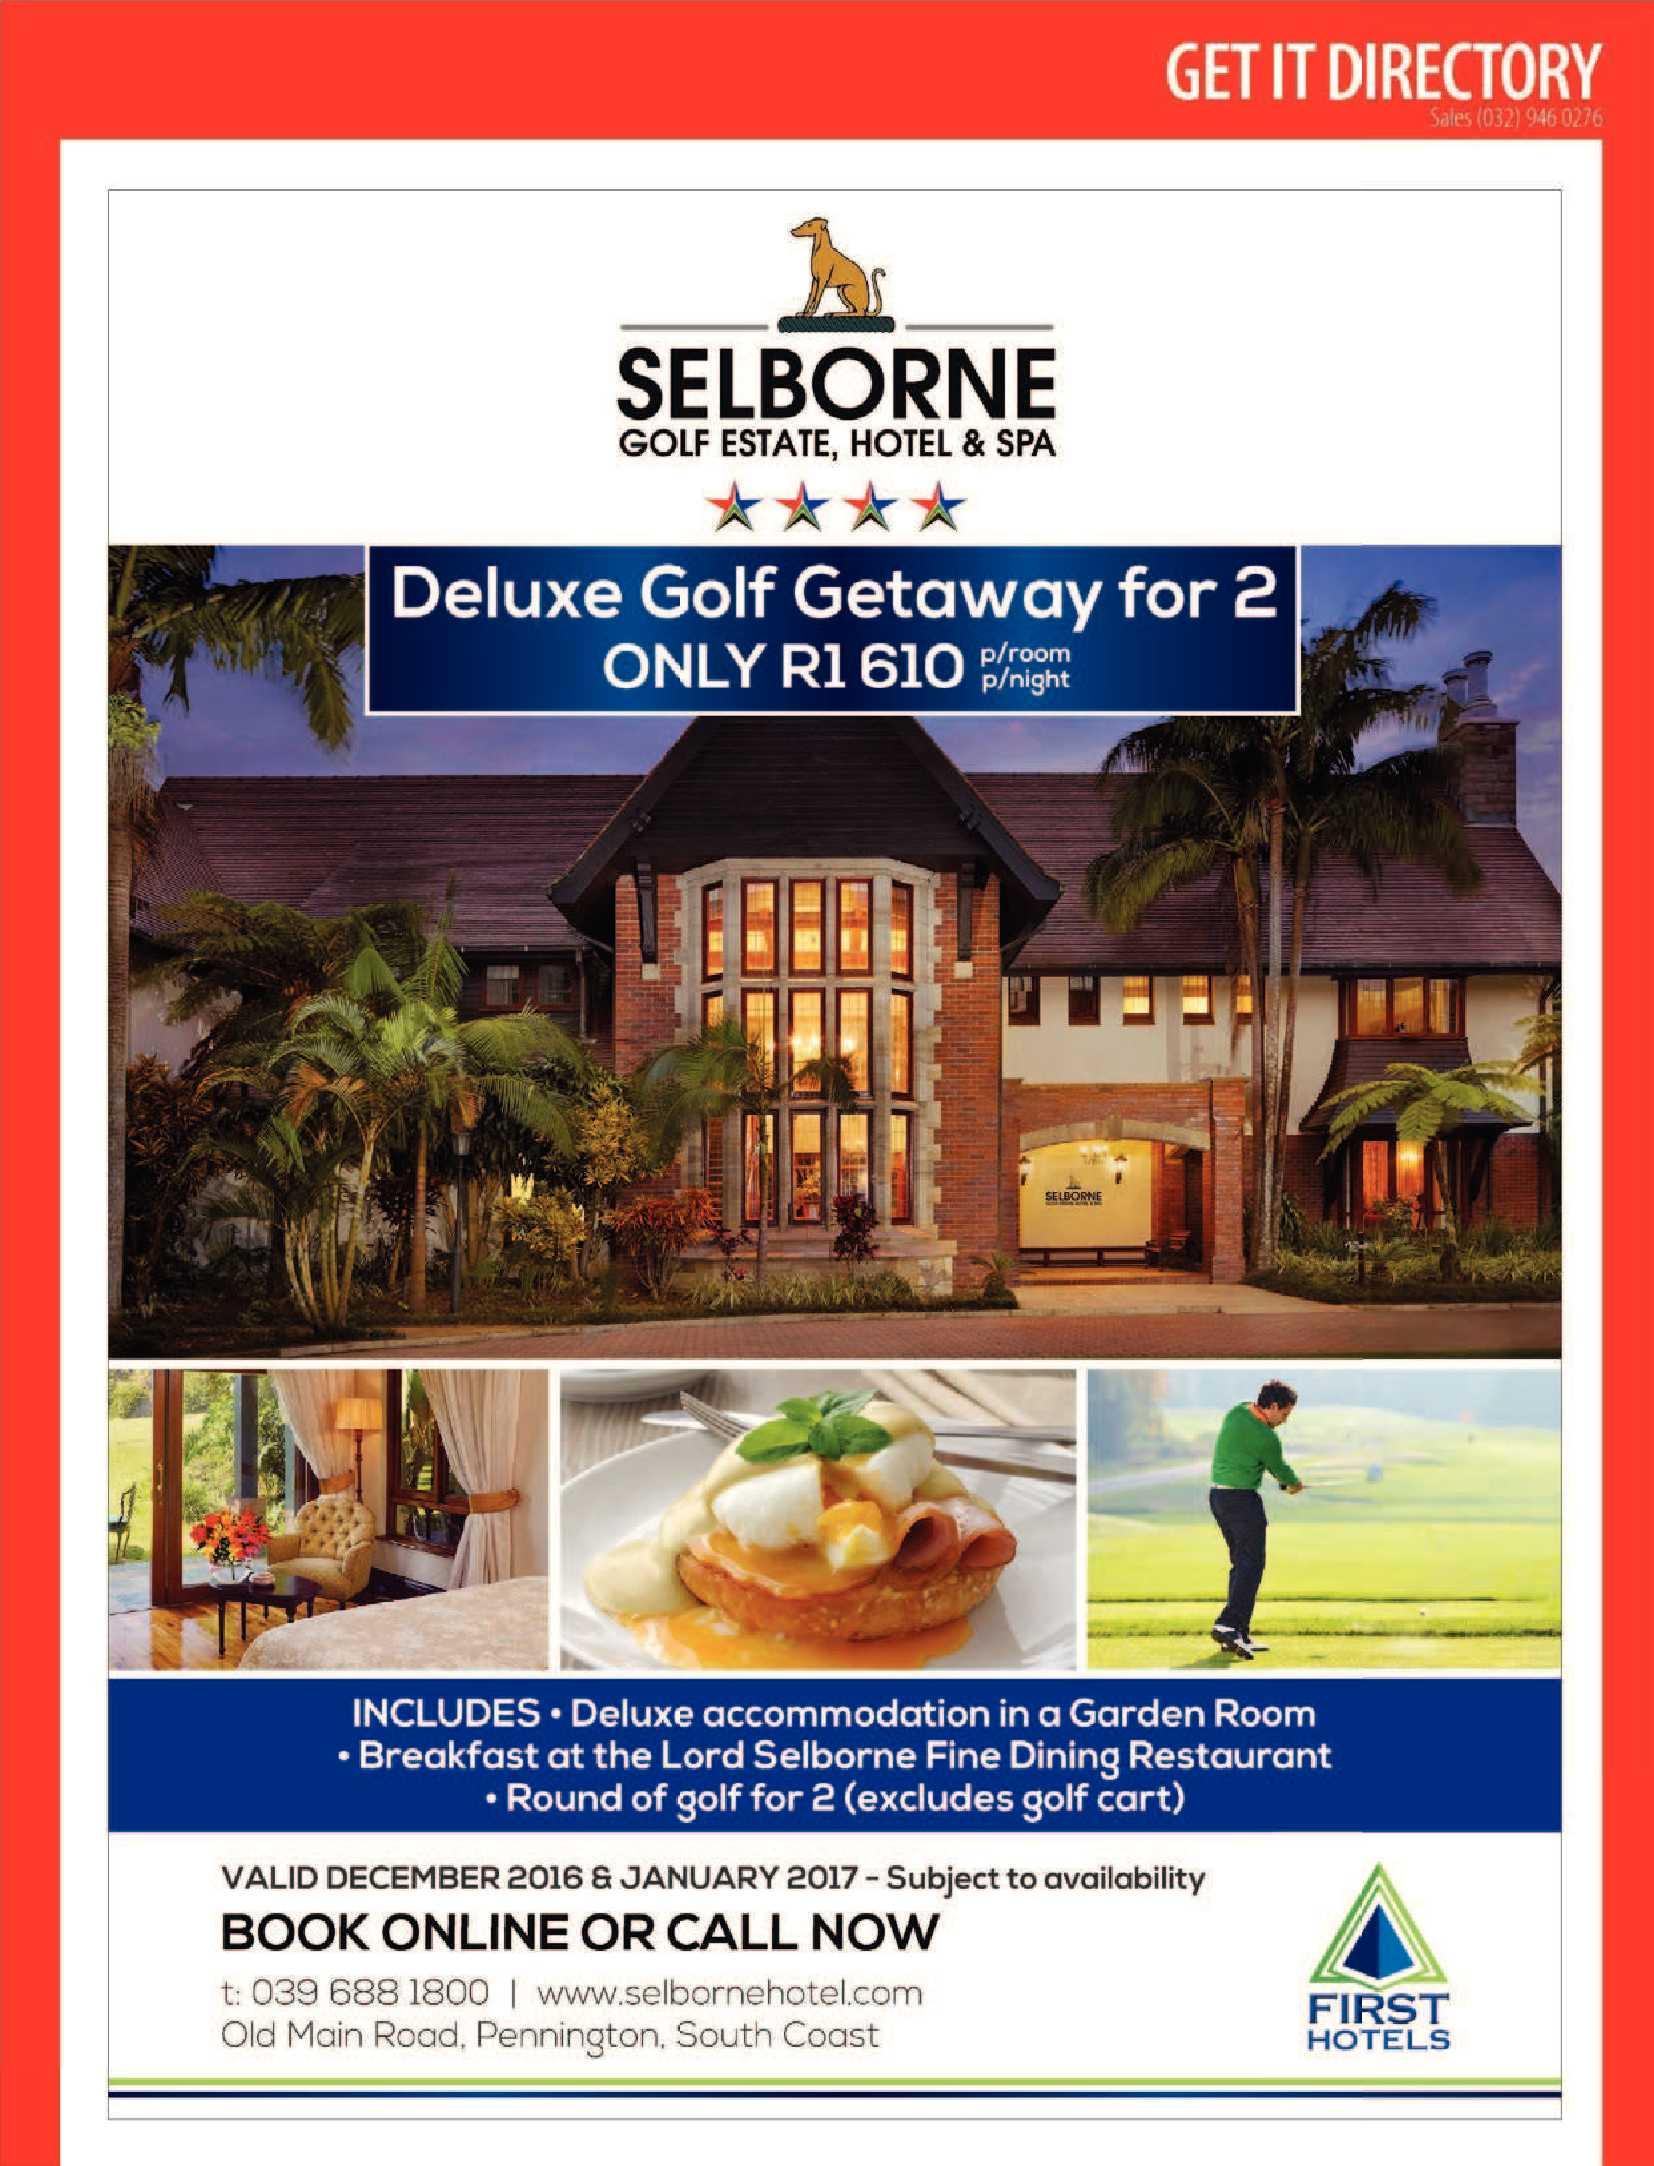 get-magazine-ballitoumhlanga-december-2016-january-2017-epapers-page-115